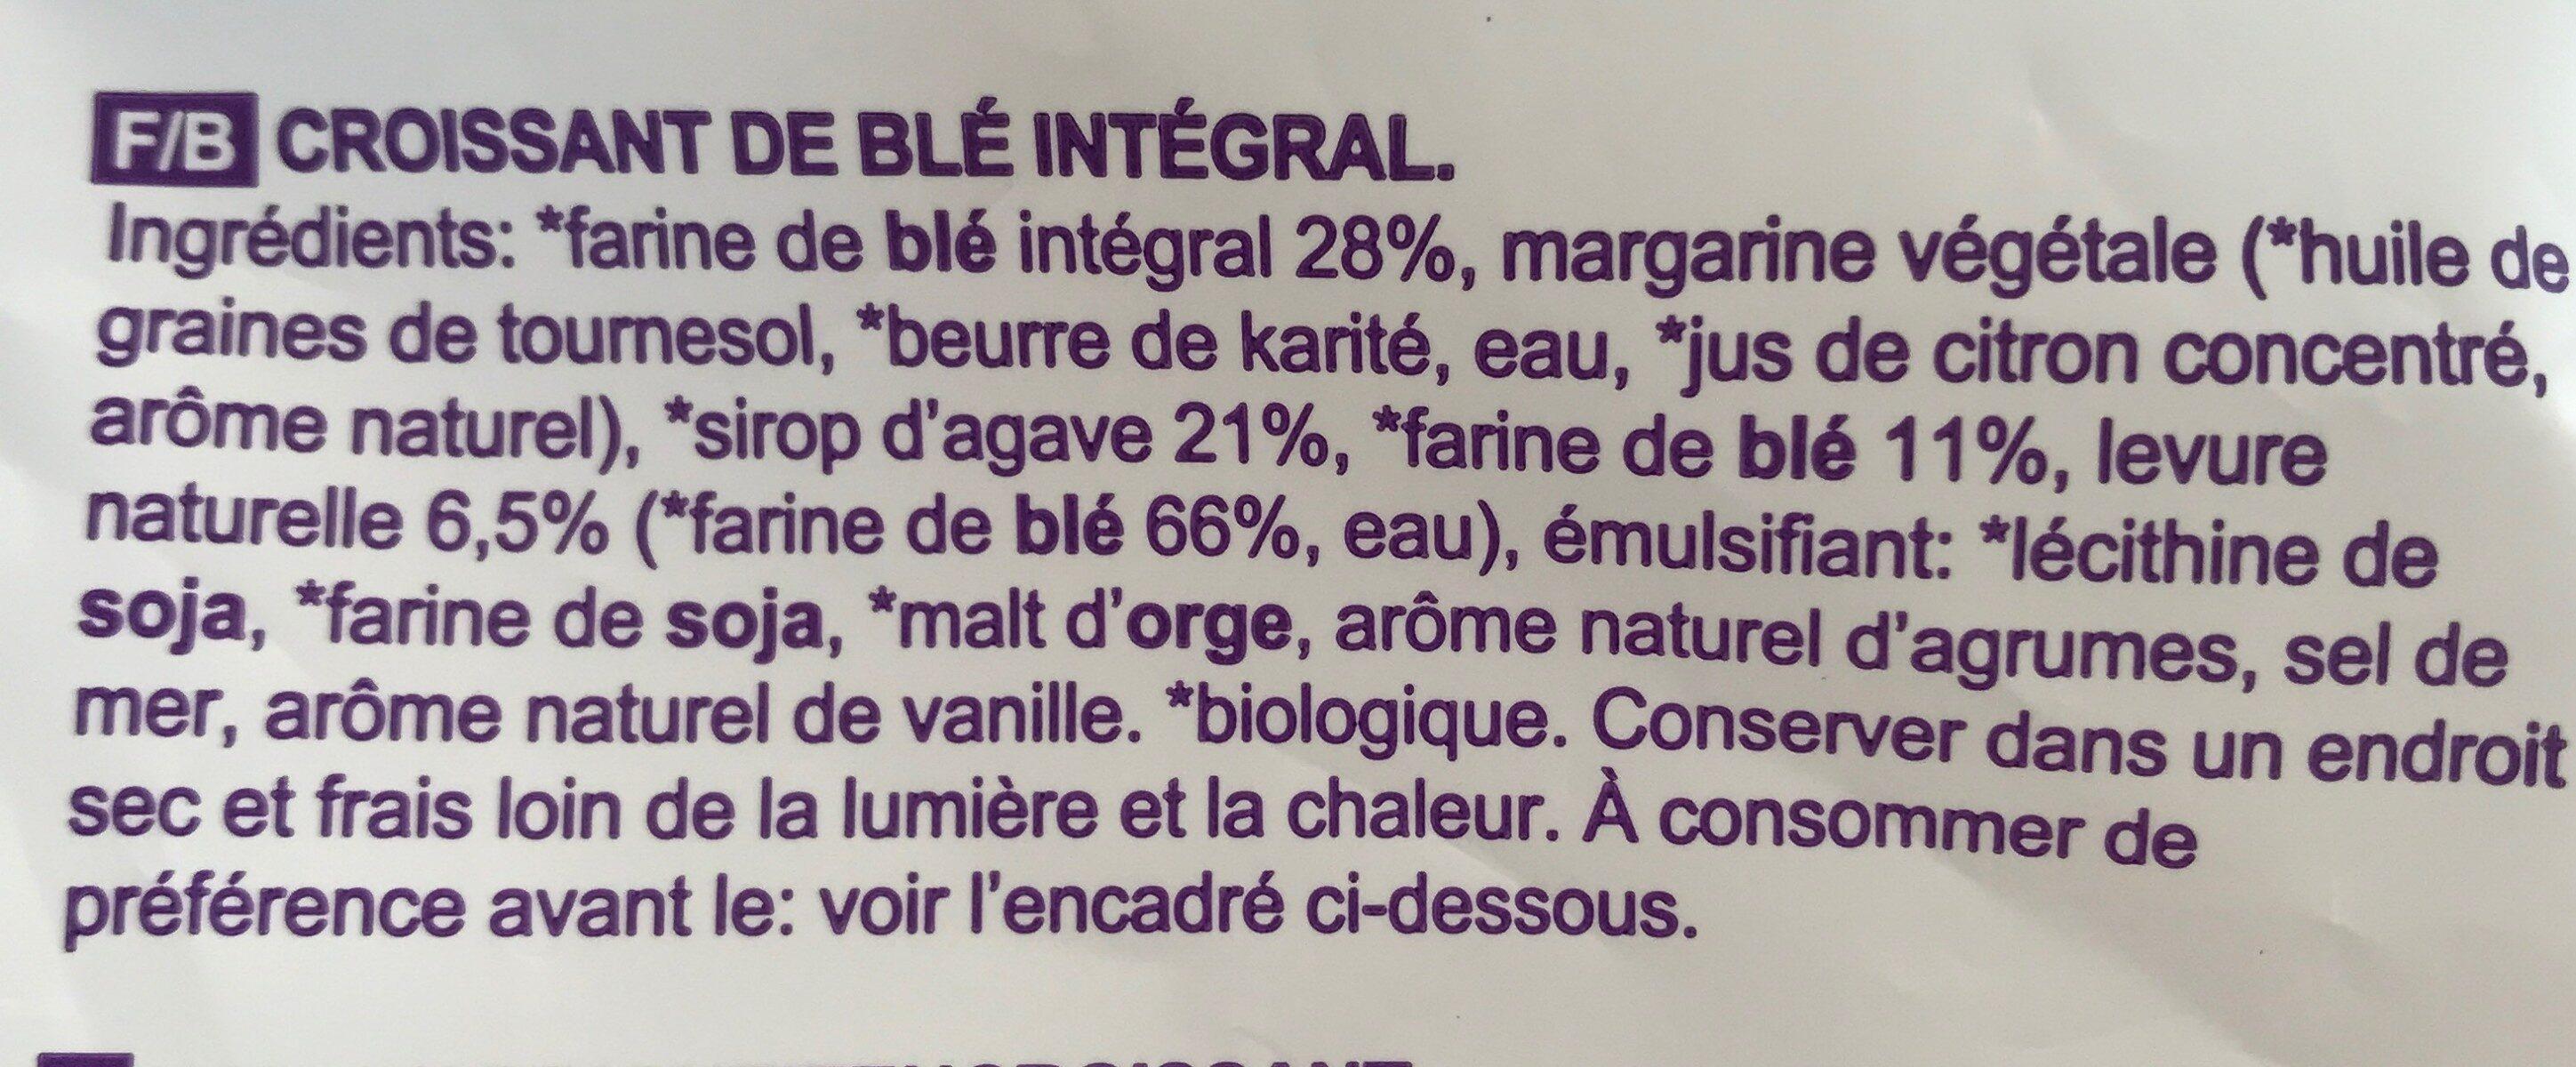 Vegan croissant integrali di frumento - Ingredienti - fr